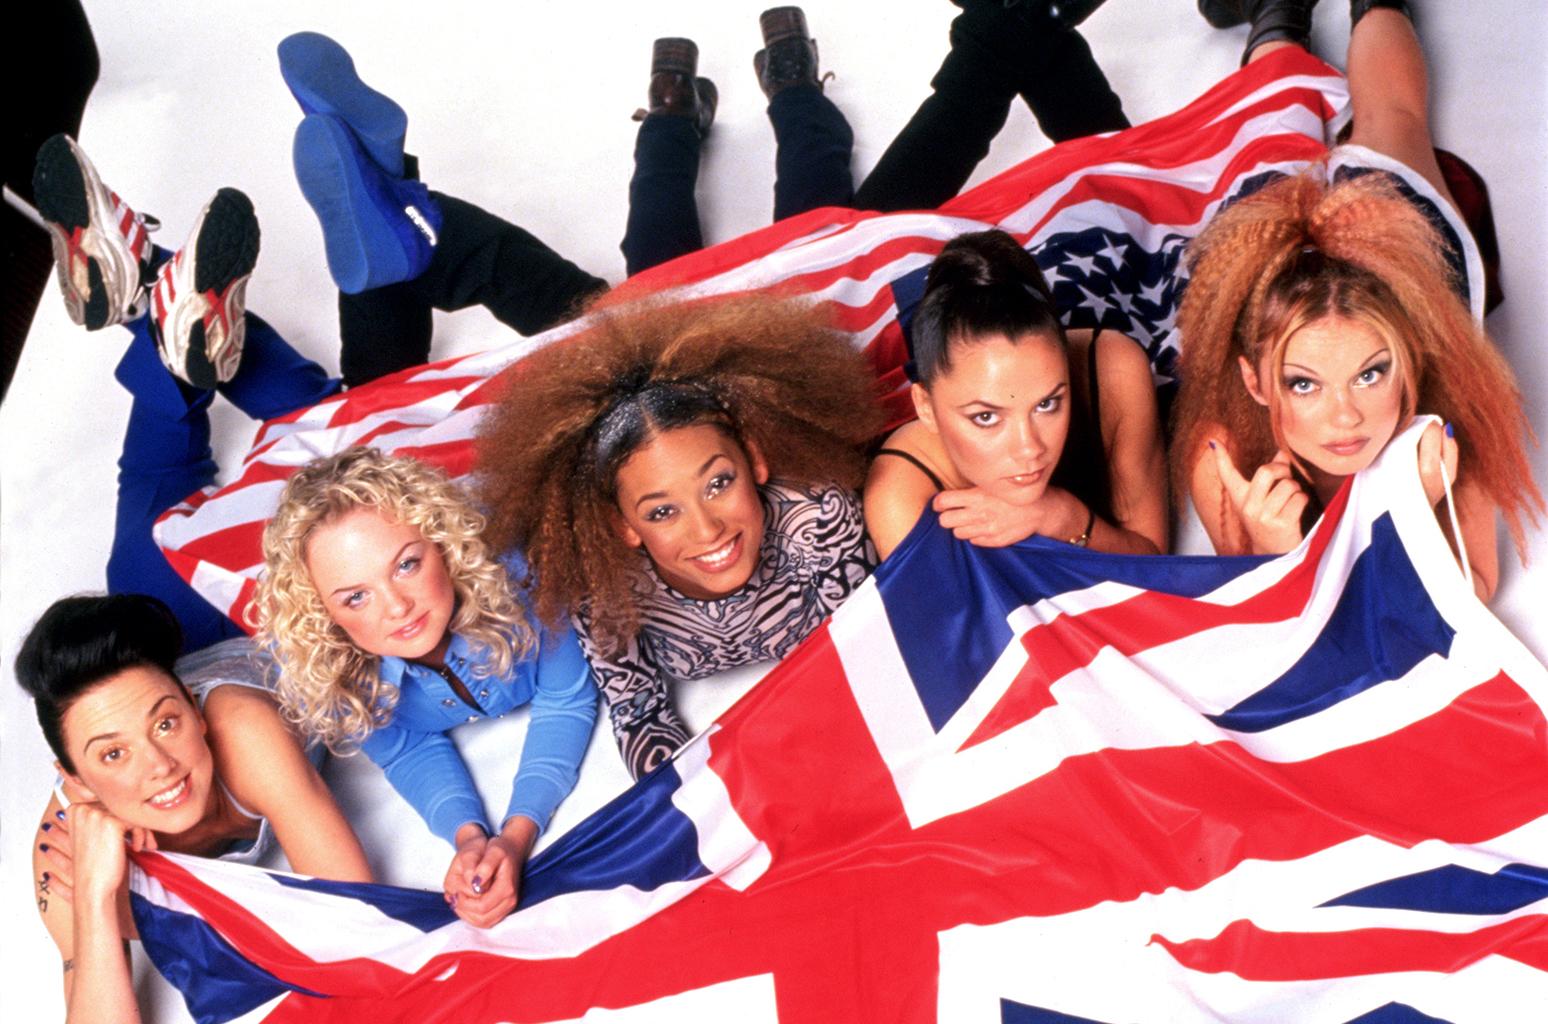 07-spice-girls-1997-billboard-1548.jpg